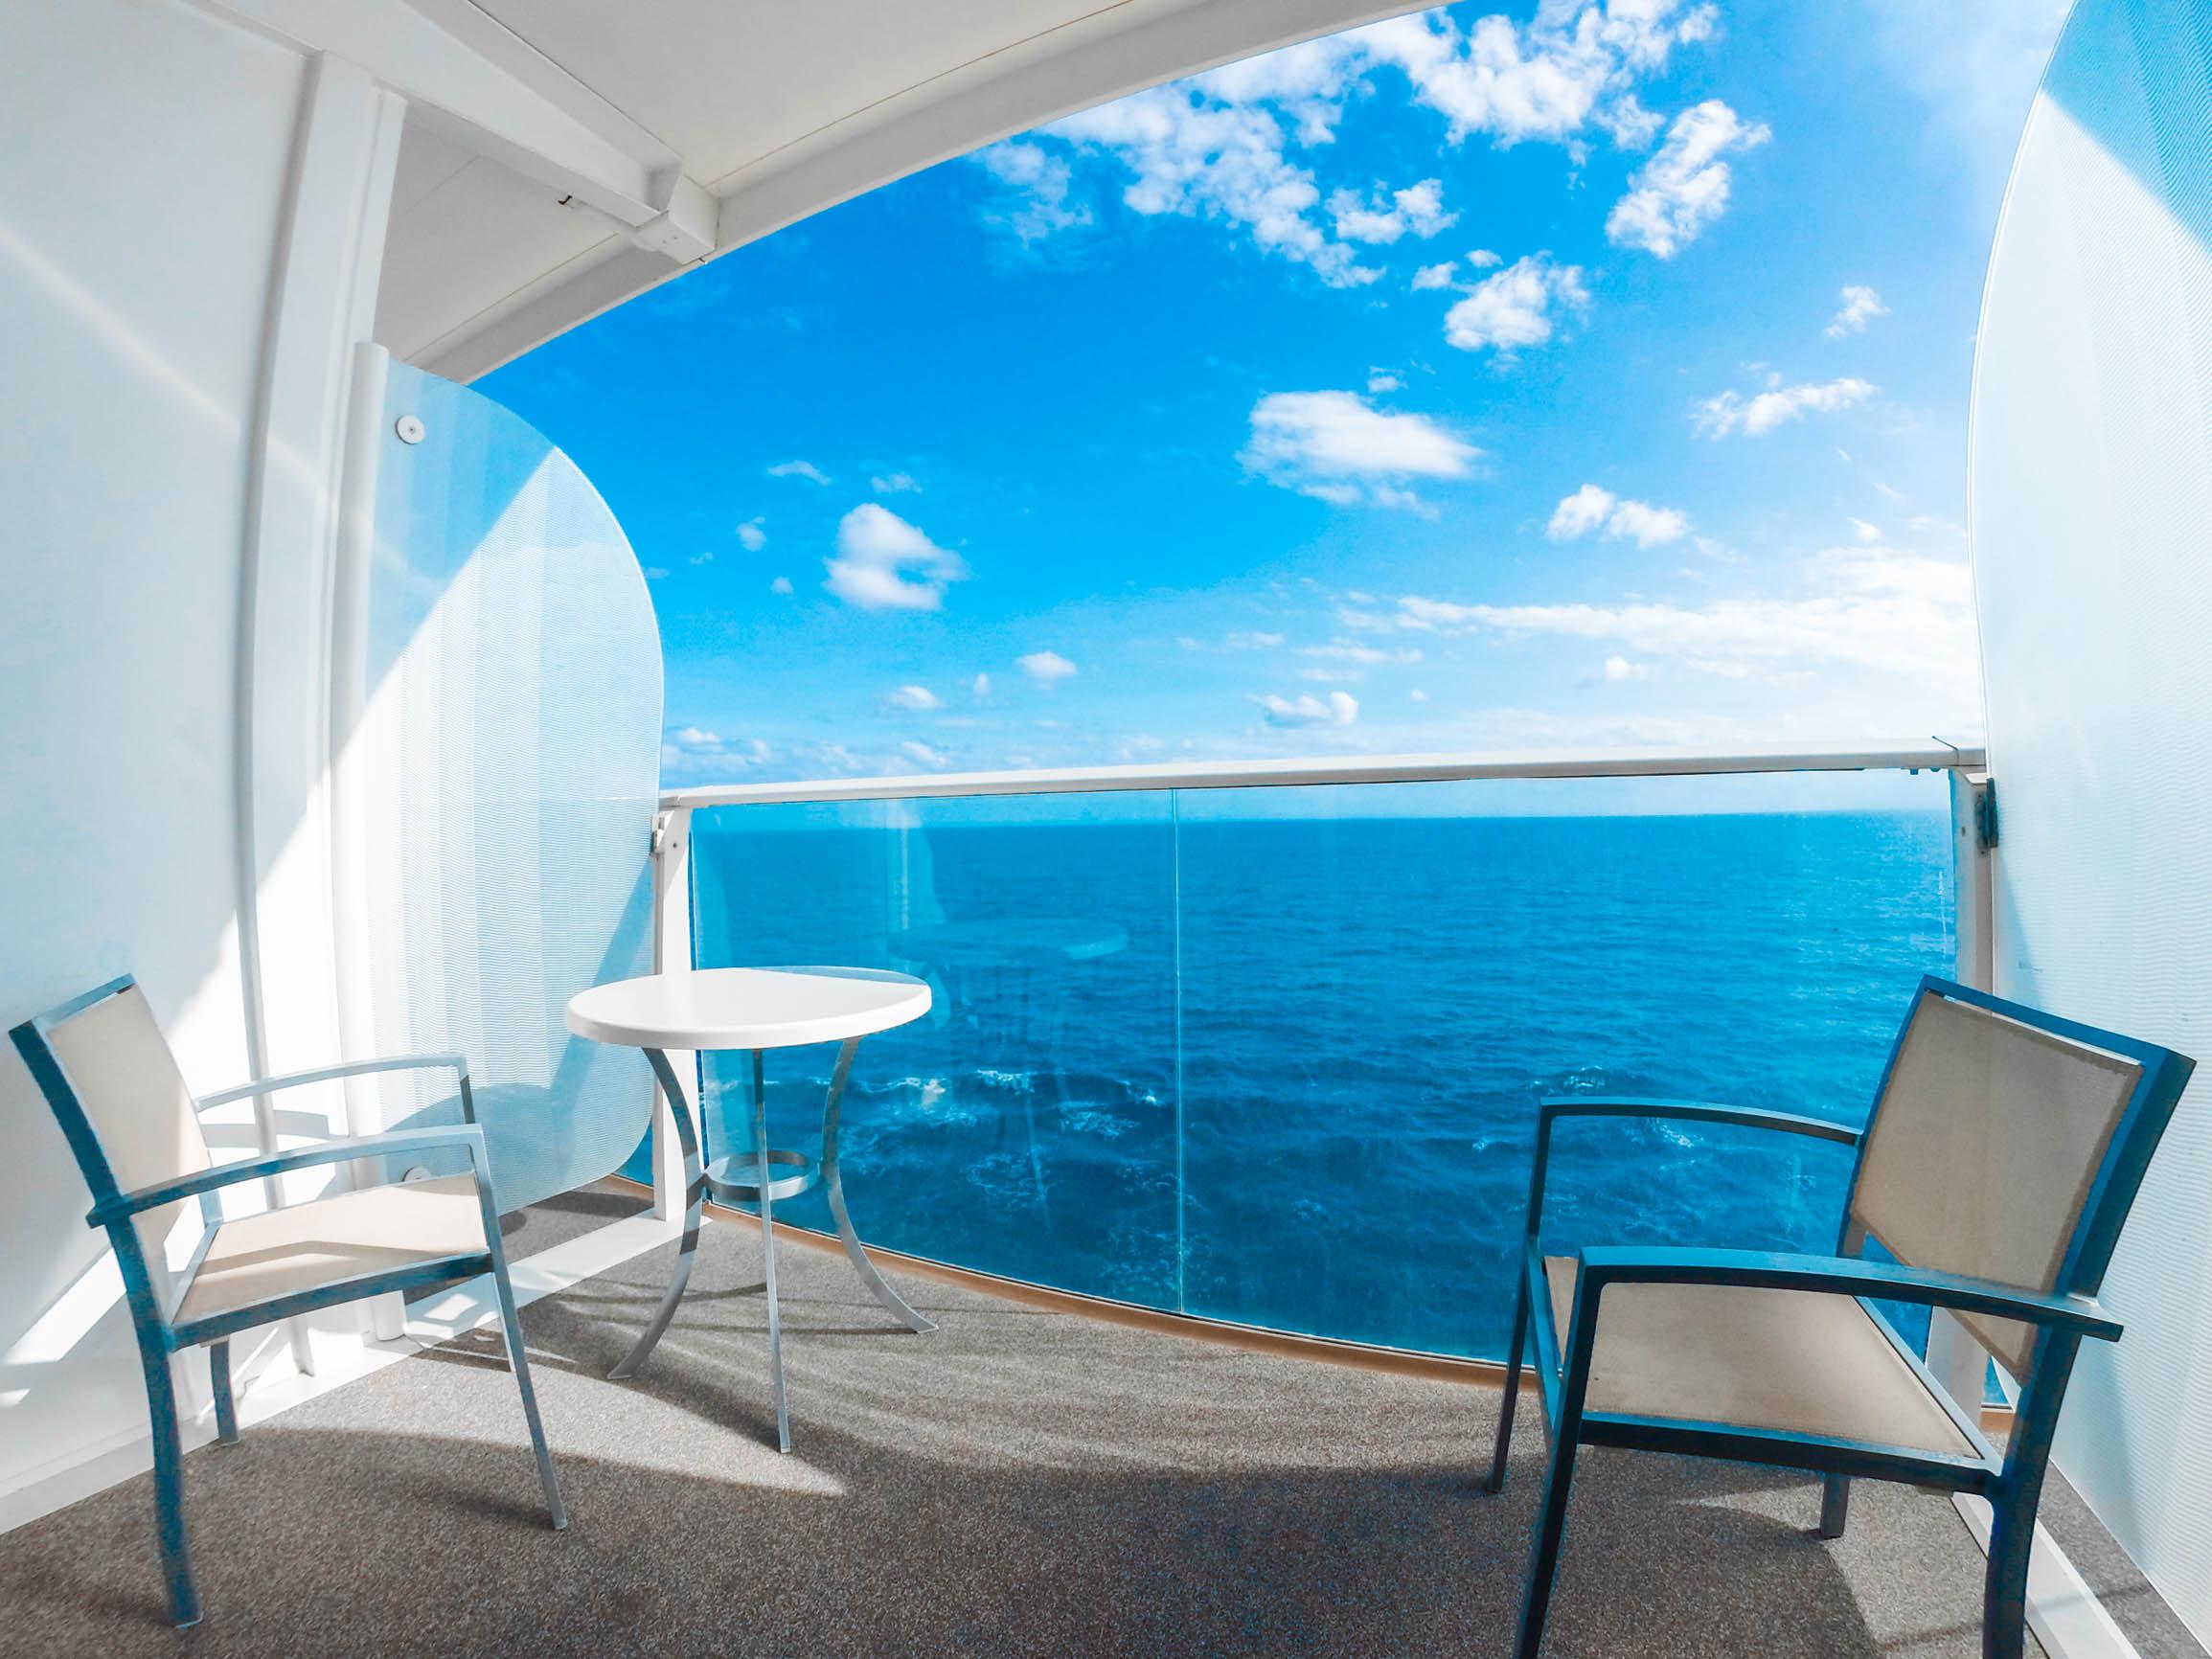 �'Ҽ��ձ����� Royal Caribbean Cruise �������� Oasis Of The Seas ���к�+����15����Ⱥ����������� 2019��8��6�ձ������� �������ǵǴ� ���߱��:7719080611